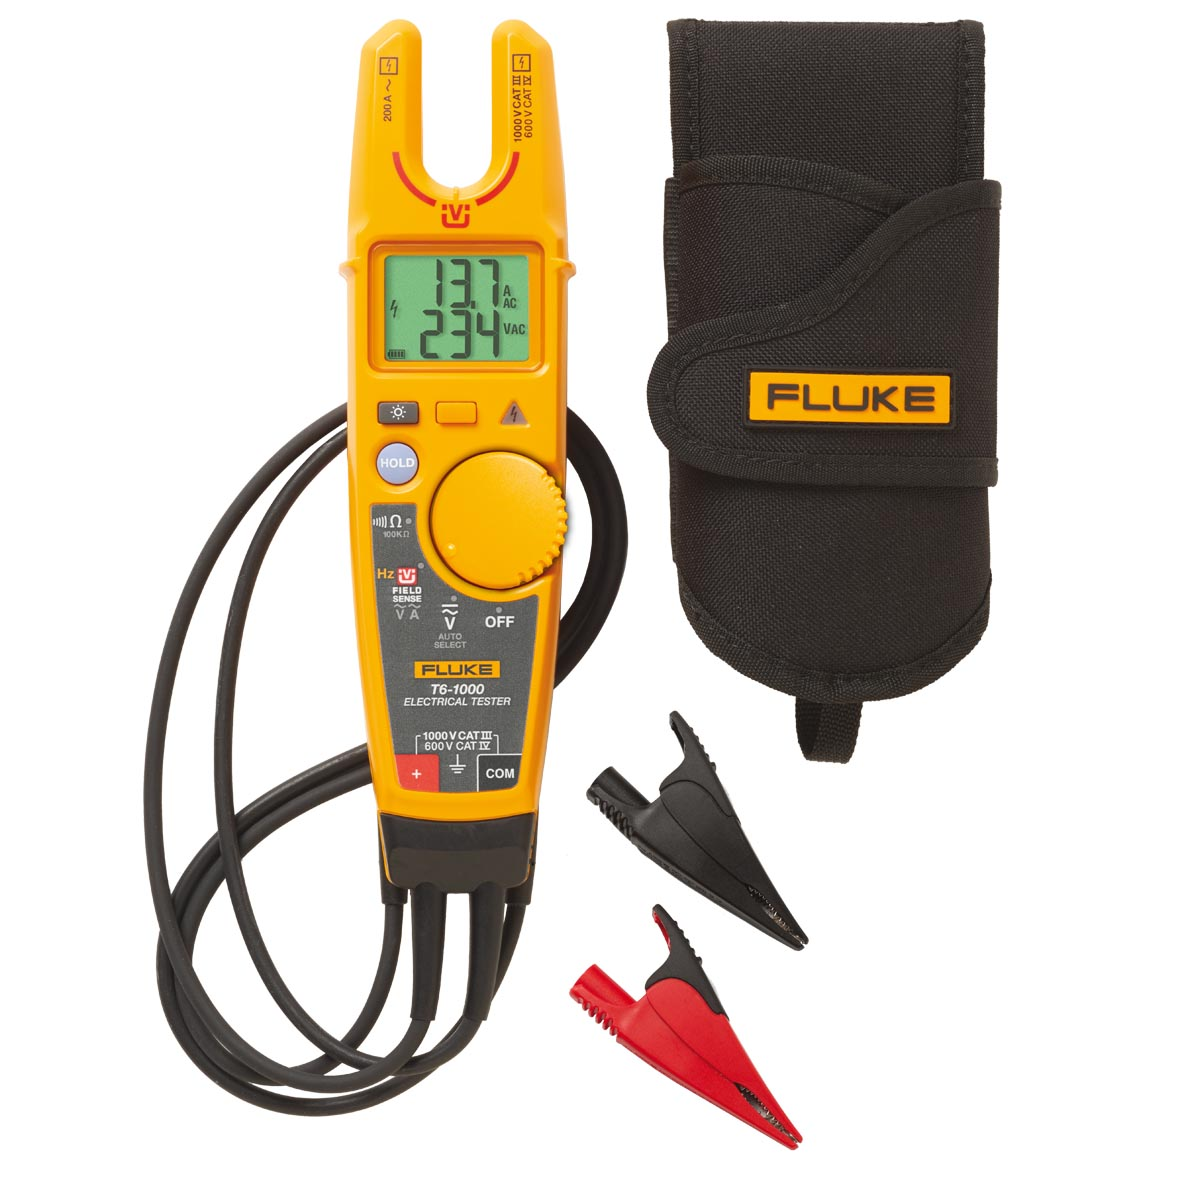 fluke t6-1000 kit elektro-tester mit fieldsense™ rund